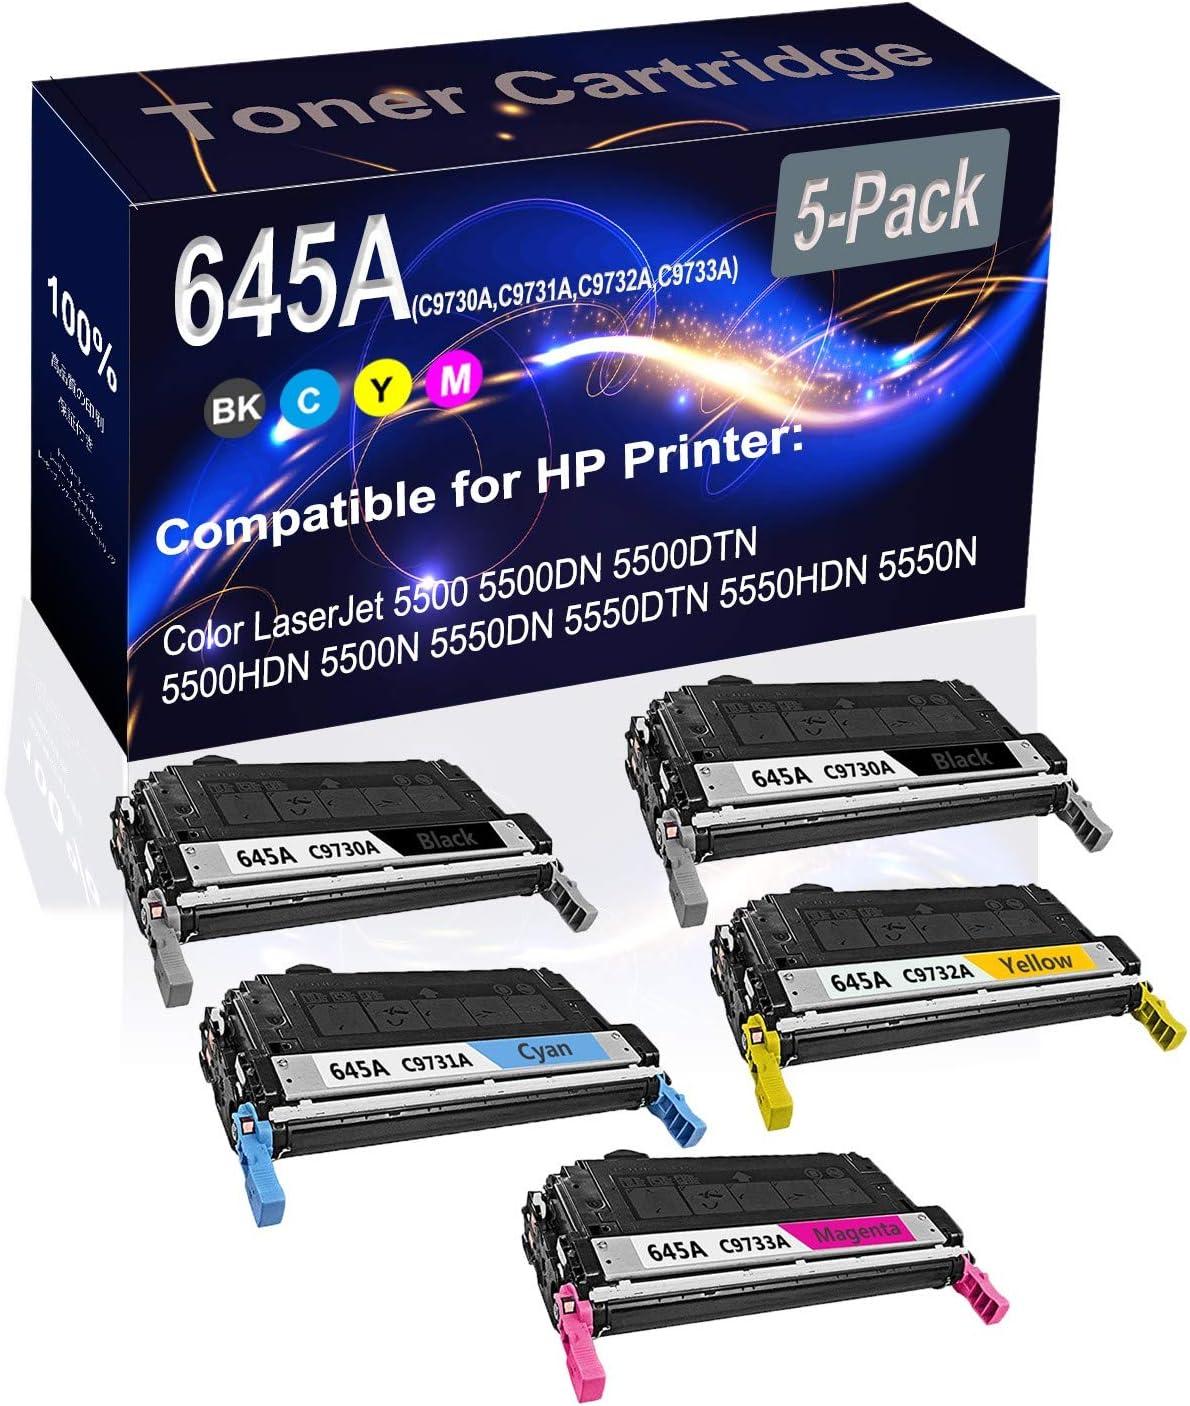 5-Pack (2BK+C+Y+M) Compatible High Yield 645A (C9730A C9731A C9732A C9733A) Printer Toner Cartridge use for HP 5500 5500DN Printers